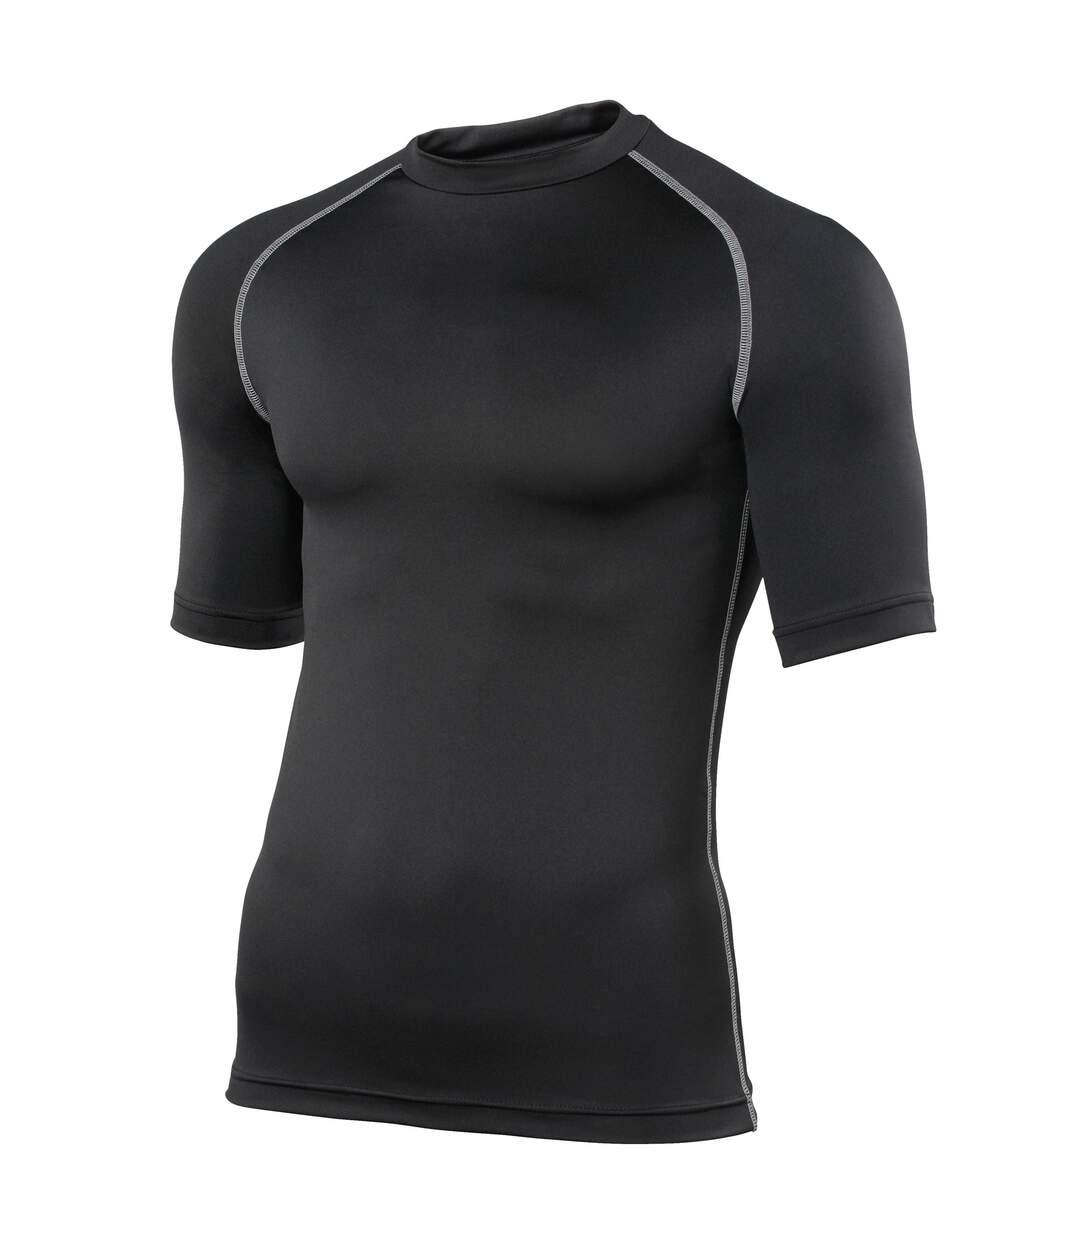 Rhino - Base layer sport à manches courtes - Homme (Noir) - UTRW1277